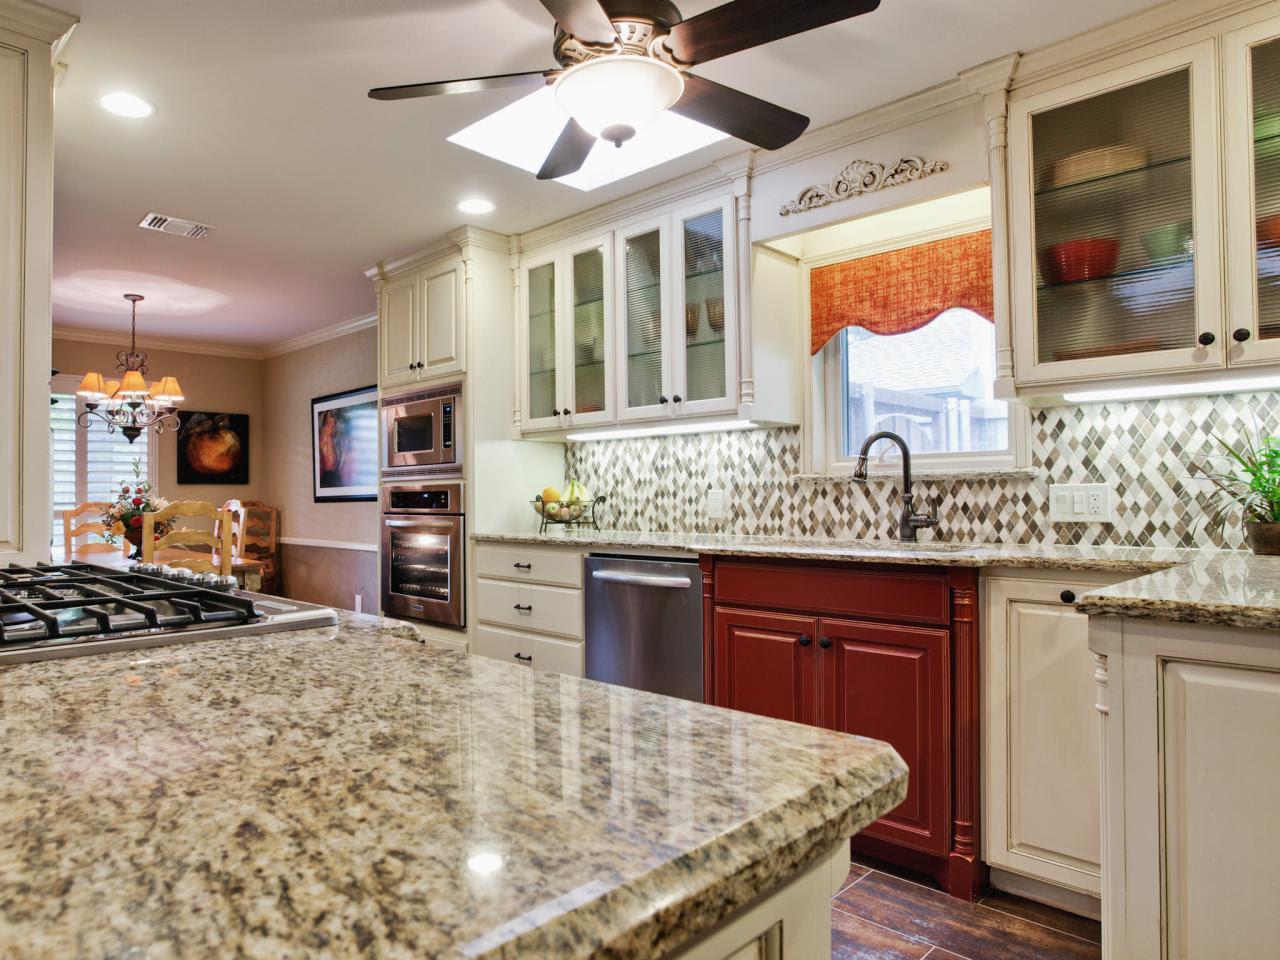 Pictures Granite Kitchen Countertop Granite with Backsplash